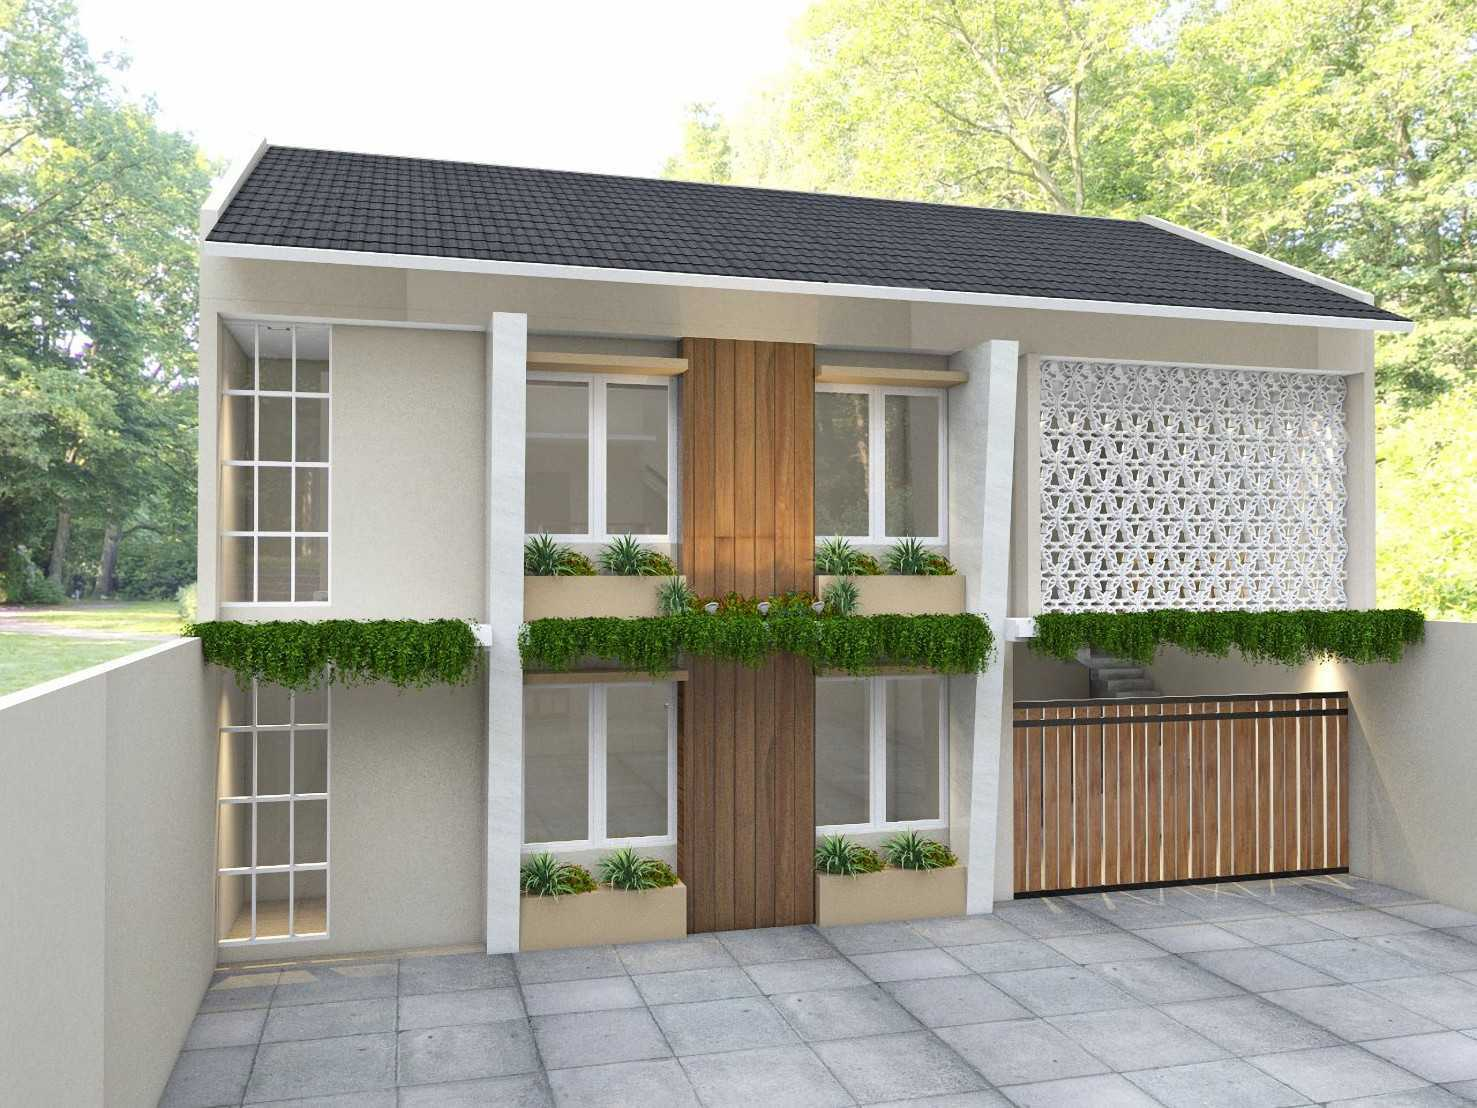 Jasa Design and Build Nuansa Studio 24 di Yogyakarta